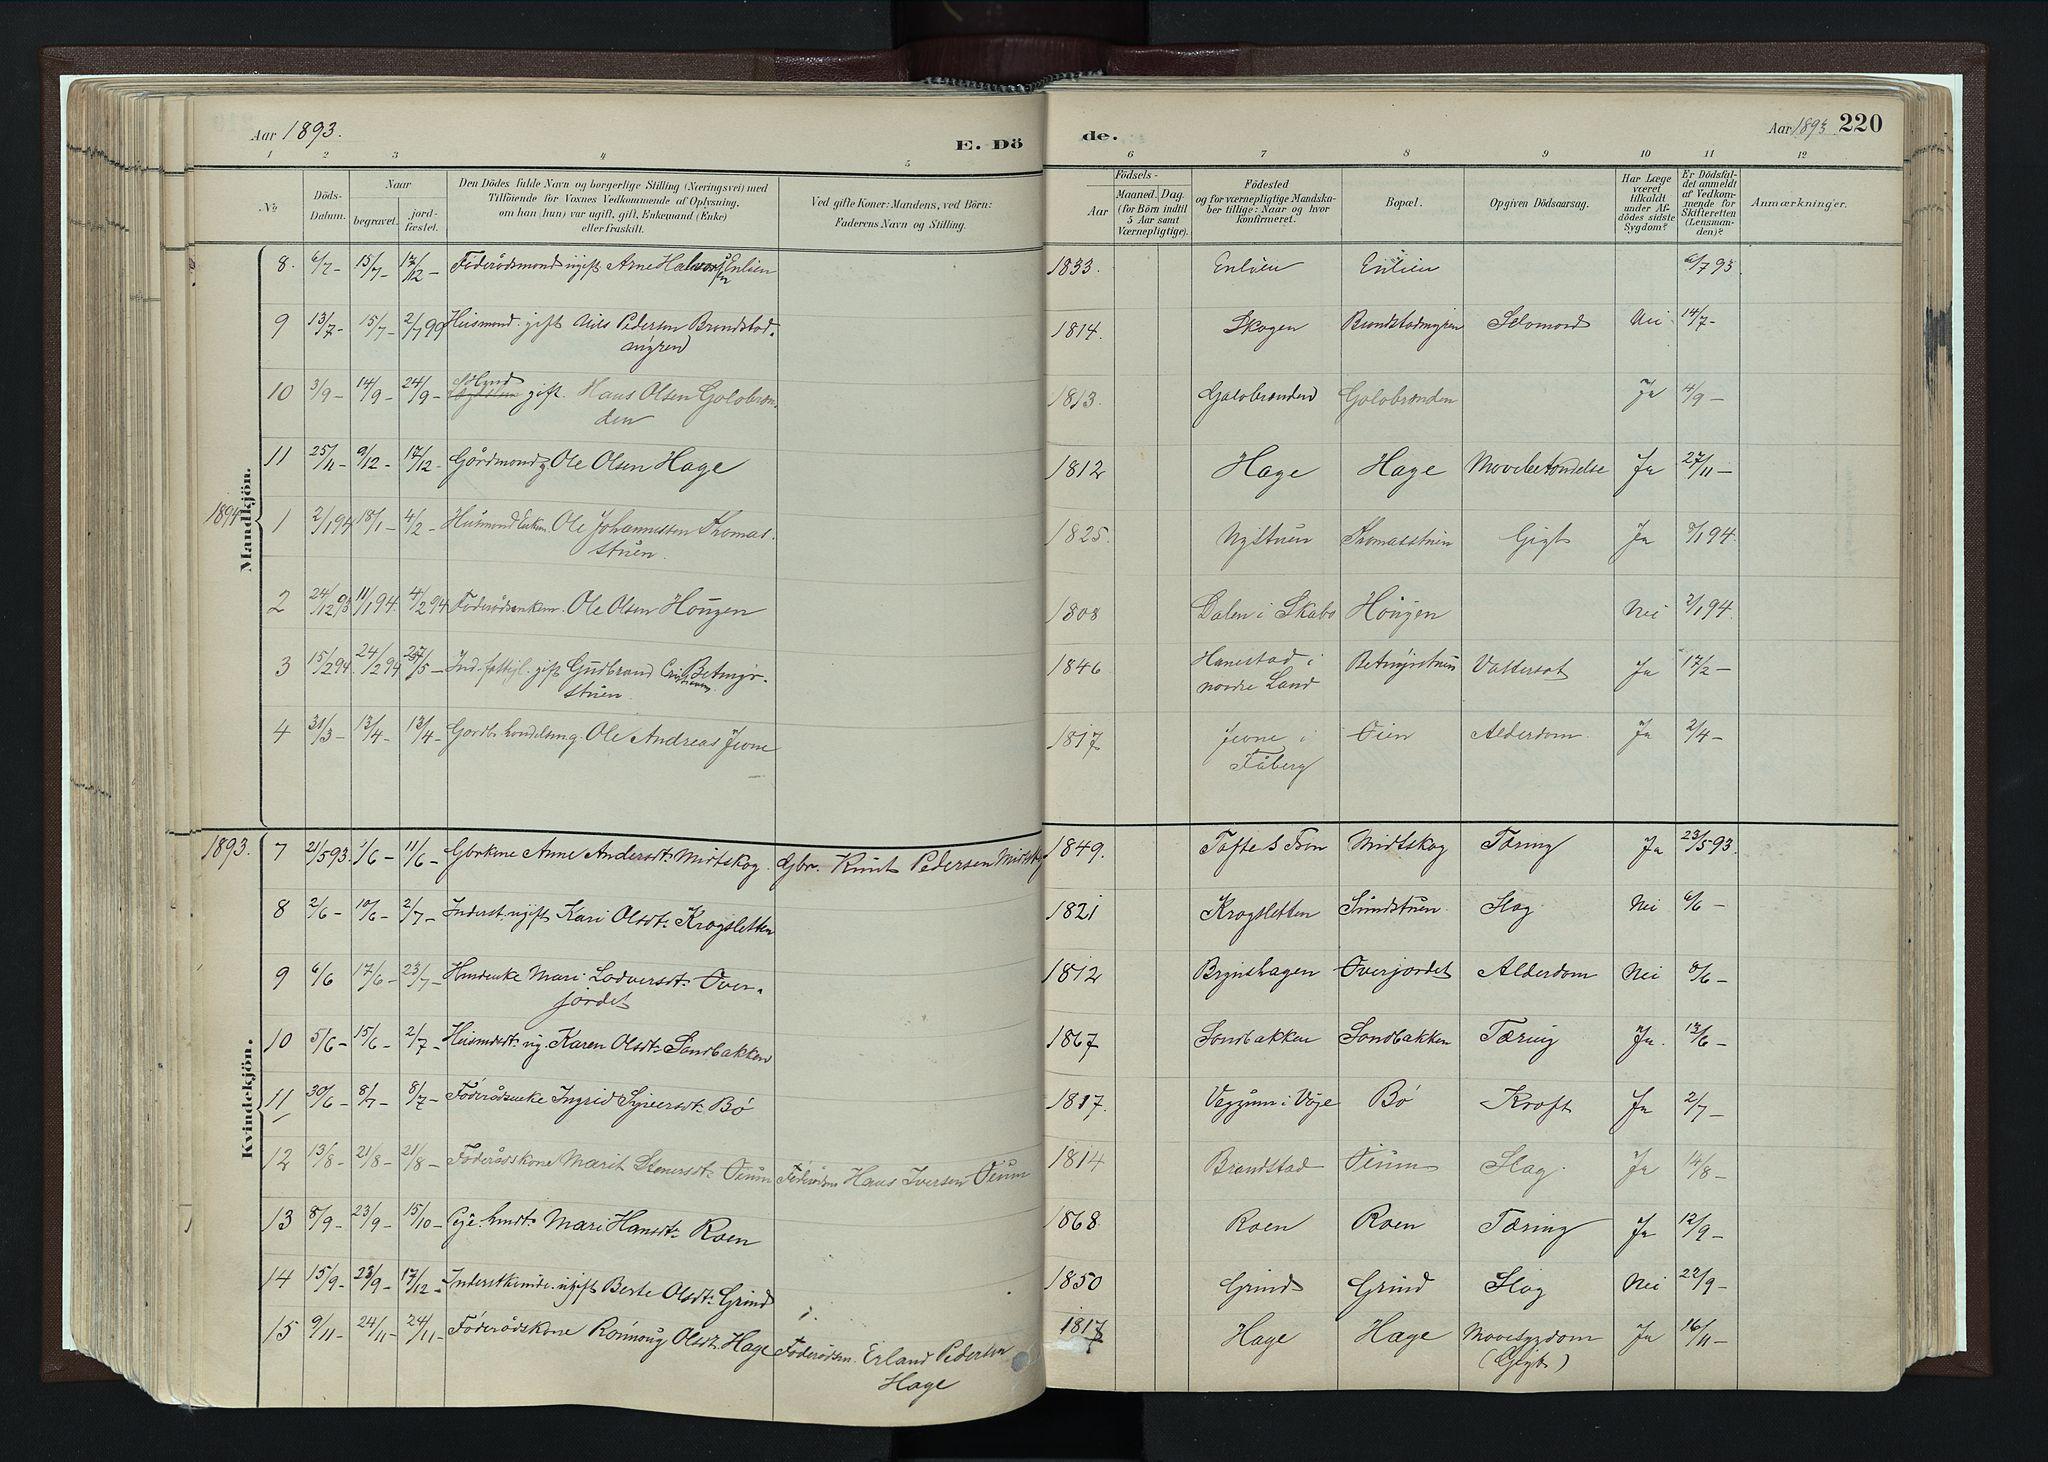 SAH, Nord-Fron prestekontor, Ministerialbok nr. 4, 1884-1914, s. 220